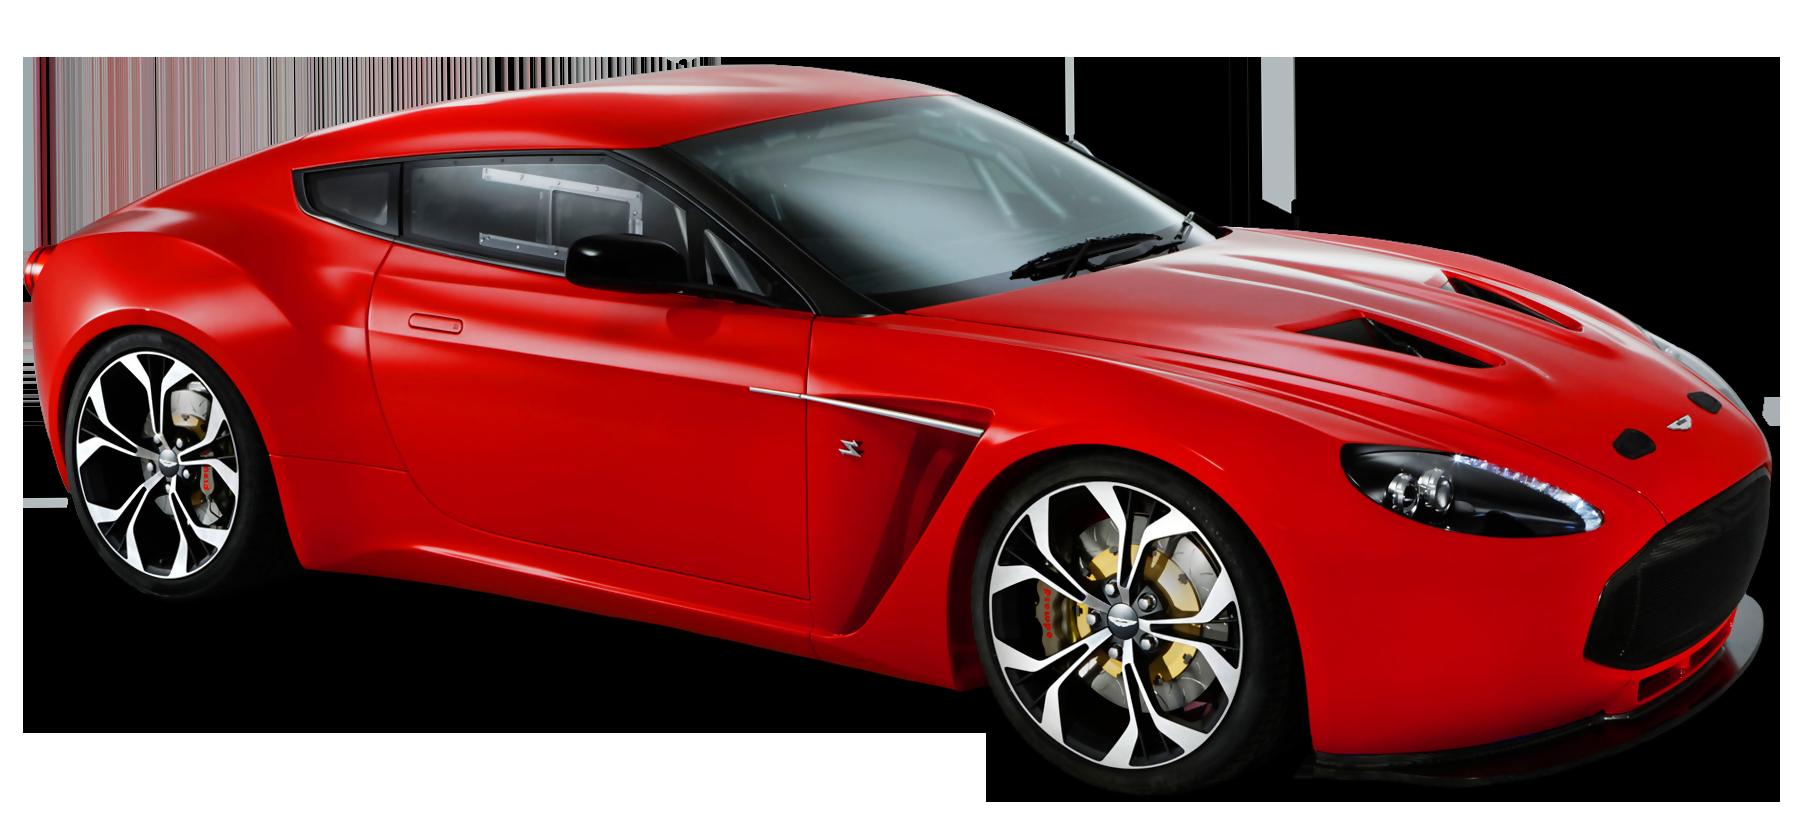 Best cars clipart jpg stock Aston Martin Car PNG Car Clipart - Best WEB Clipart jpg stock